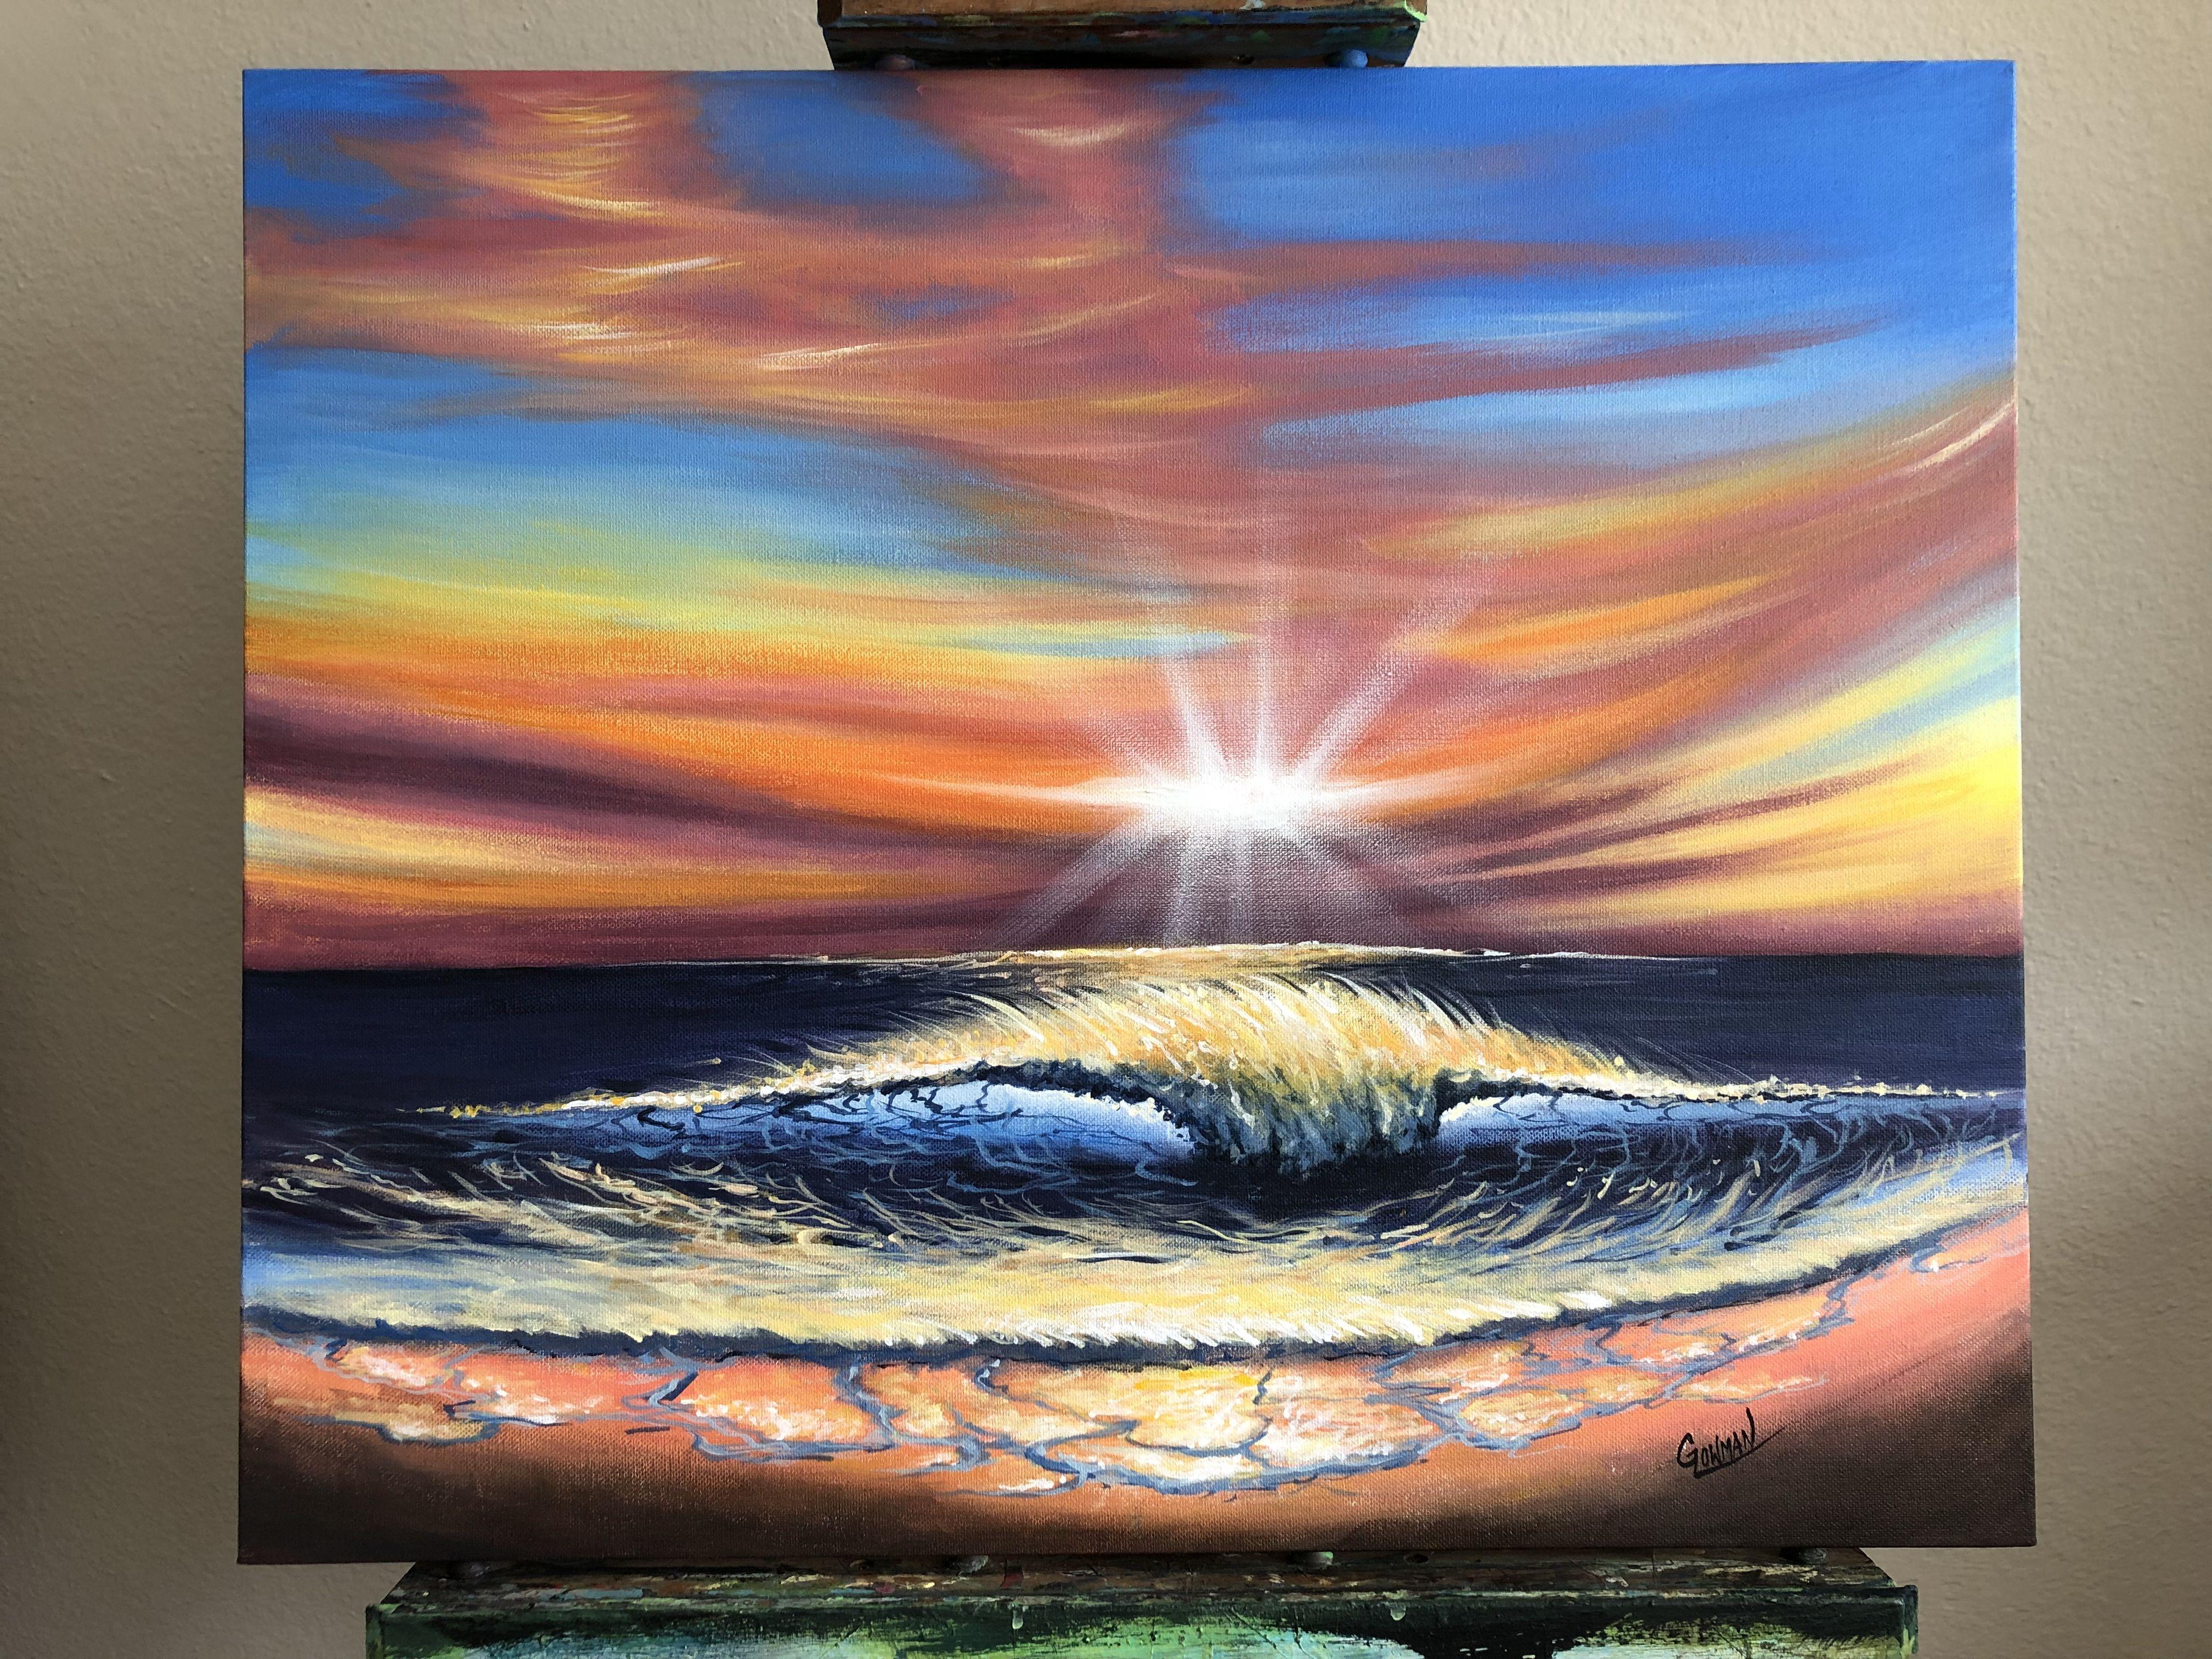 Simple Landscape Paintings Sunset Beach Sunset Landscape With